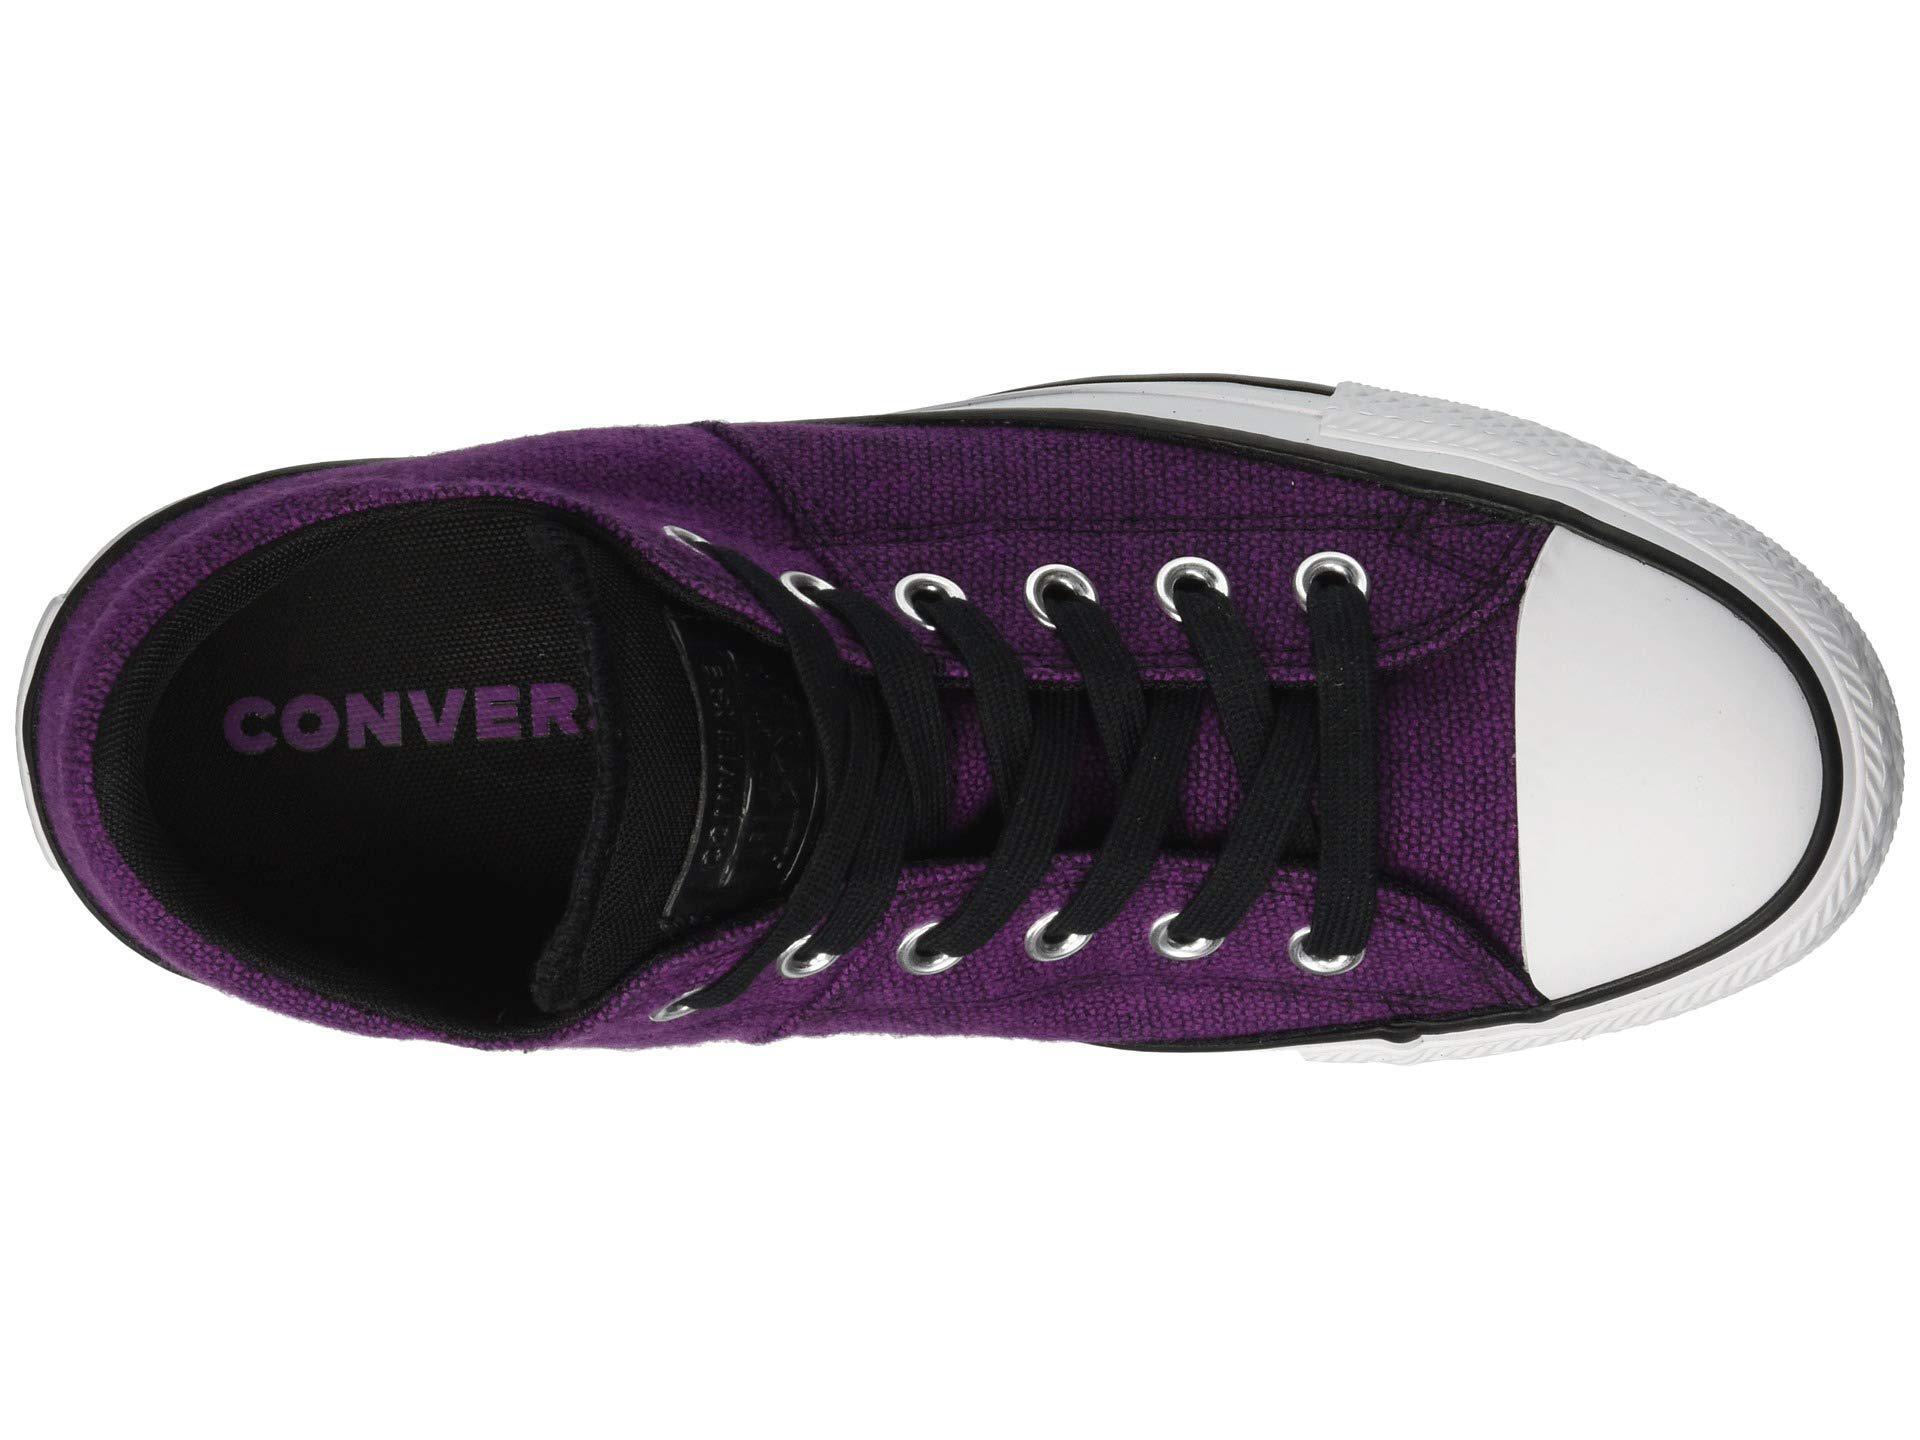 Converse - Purple Chuck Taylor All Star Madison - Ox - Lyst. View fullscreen e5d99814c